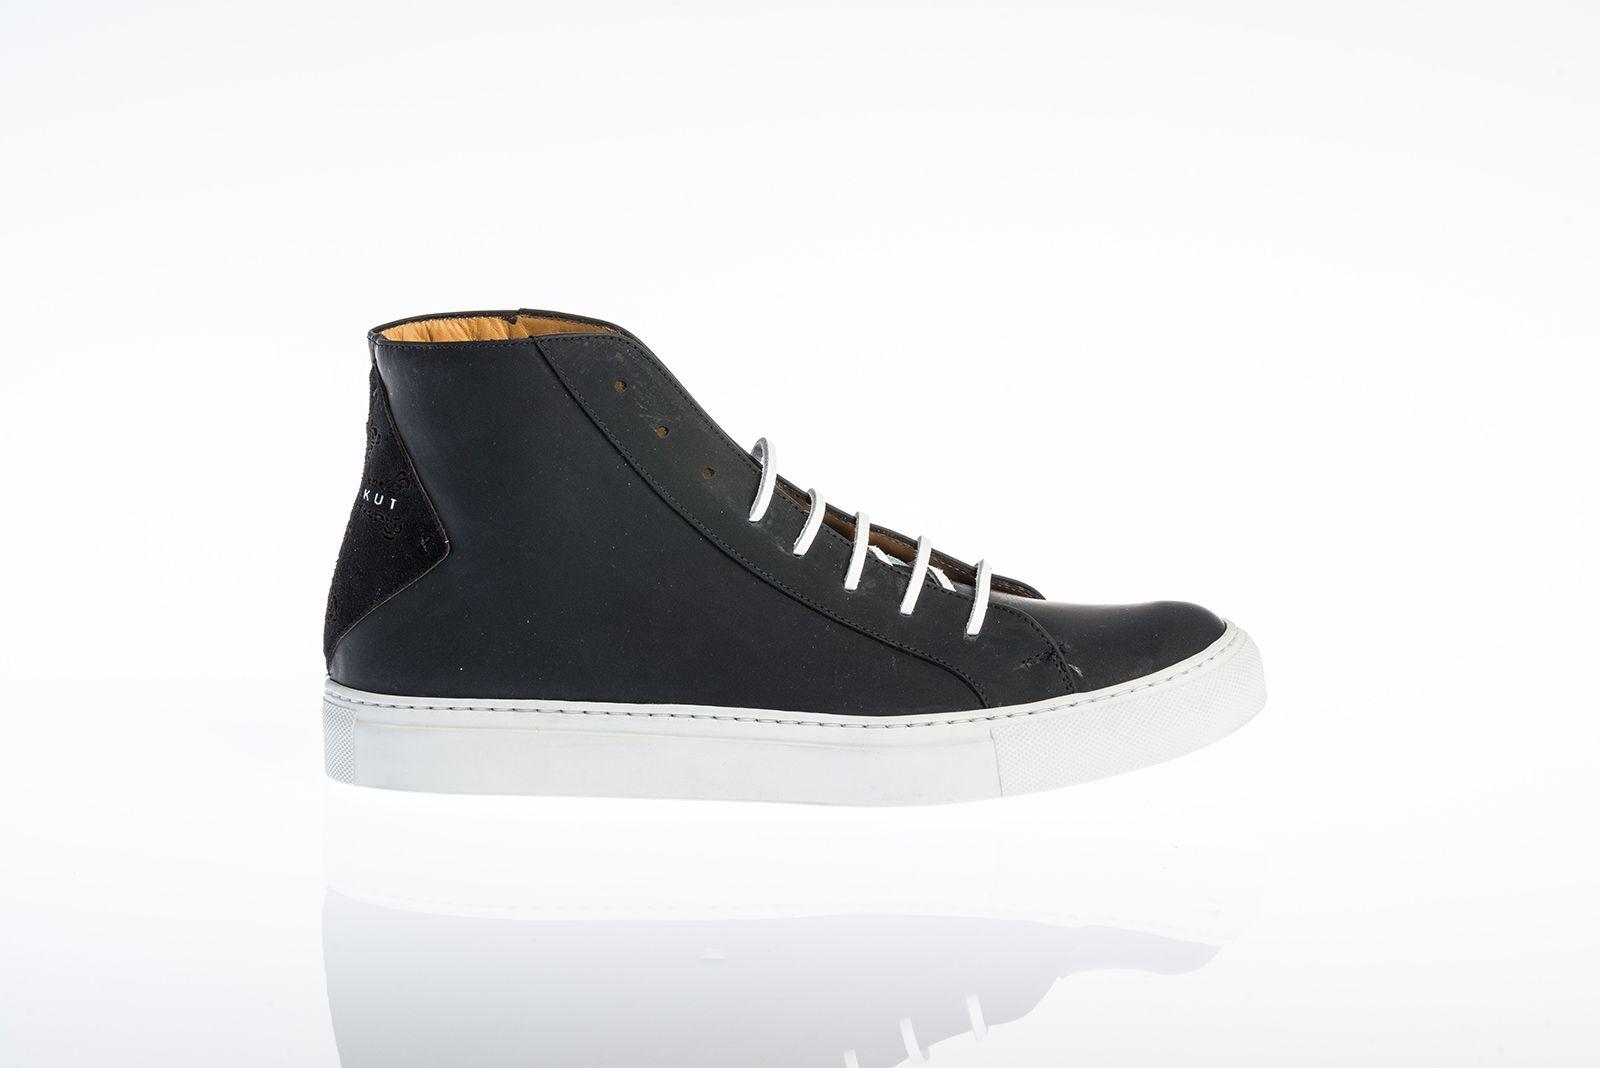 Skullkut sneakers London black